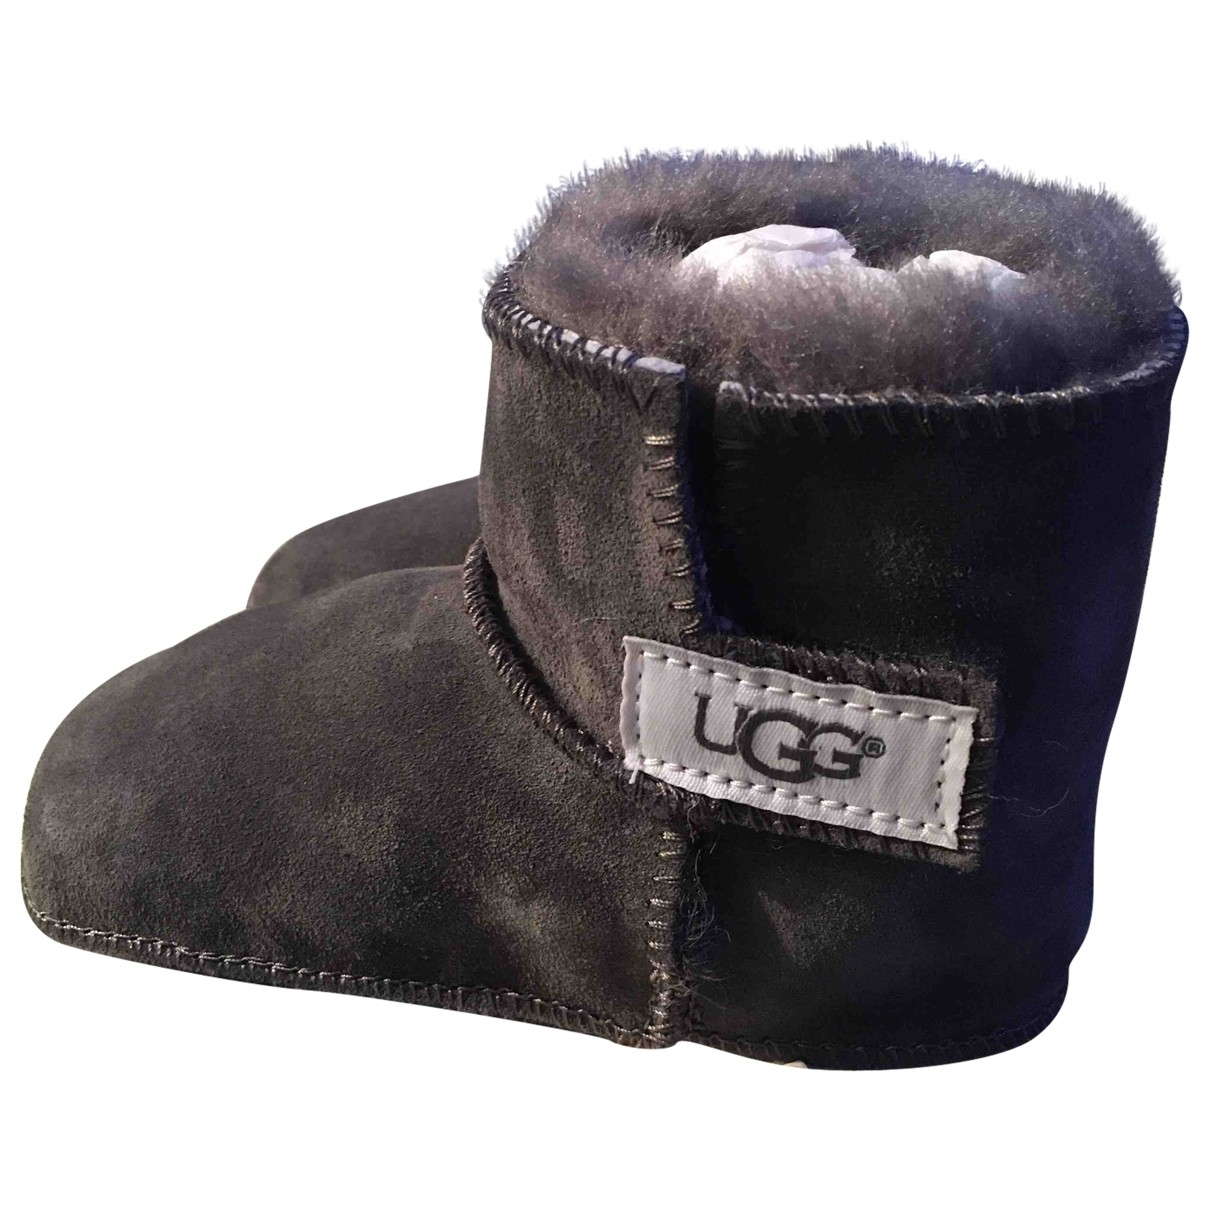 Ugg - Bottes.Bottines   pour enfant en cuir - gris